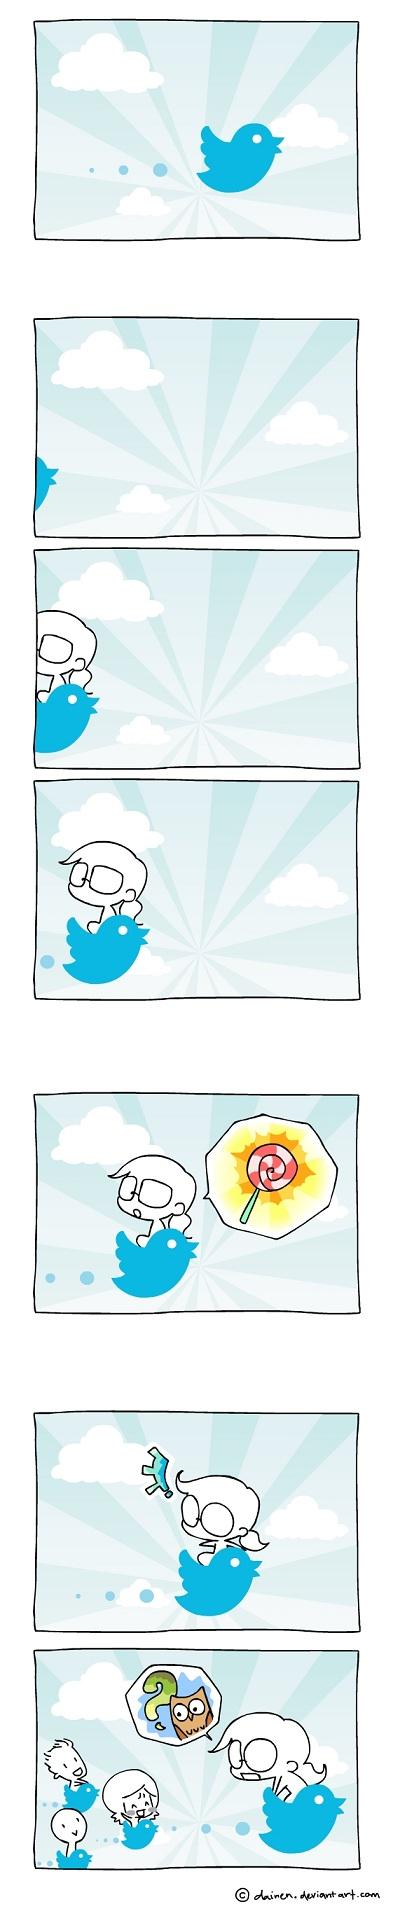 Twitter by DaineN